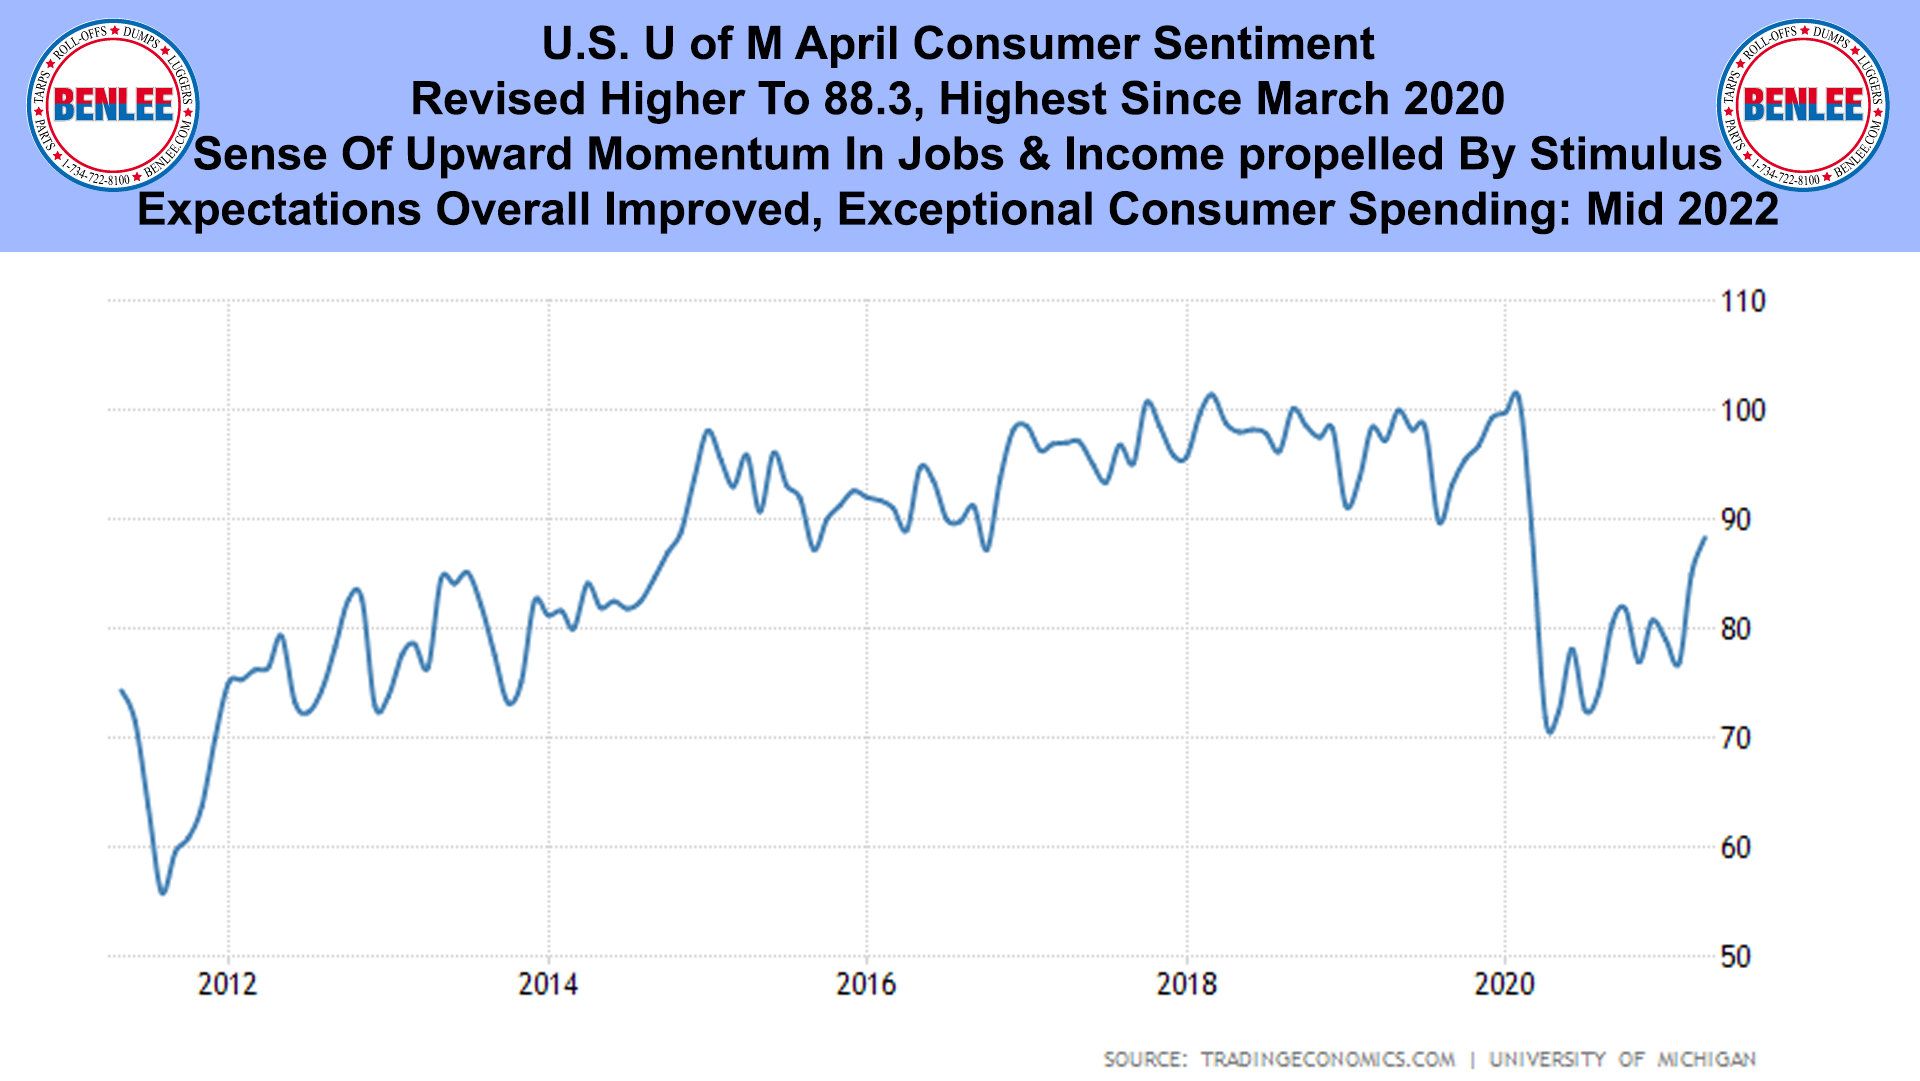 U.S. U of M April Consumer Sentiment